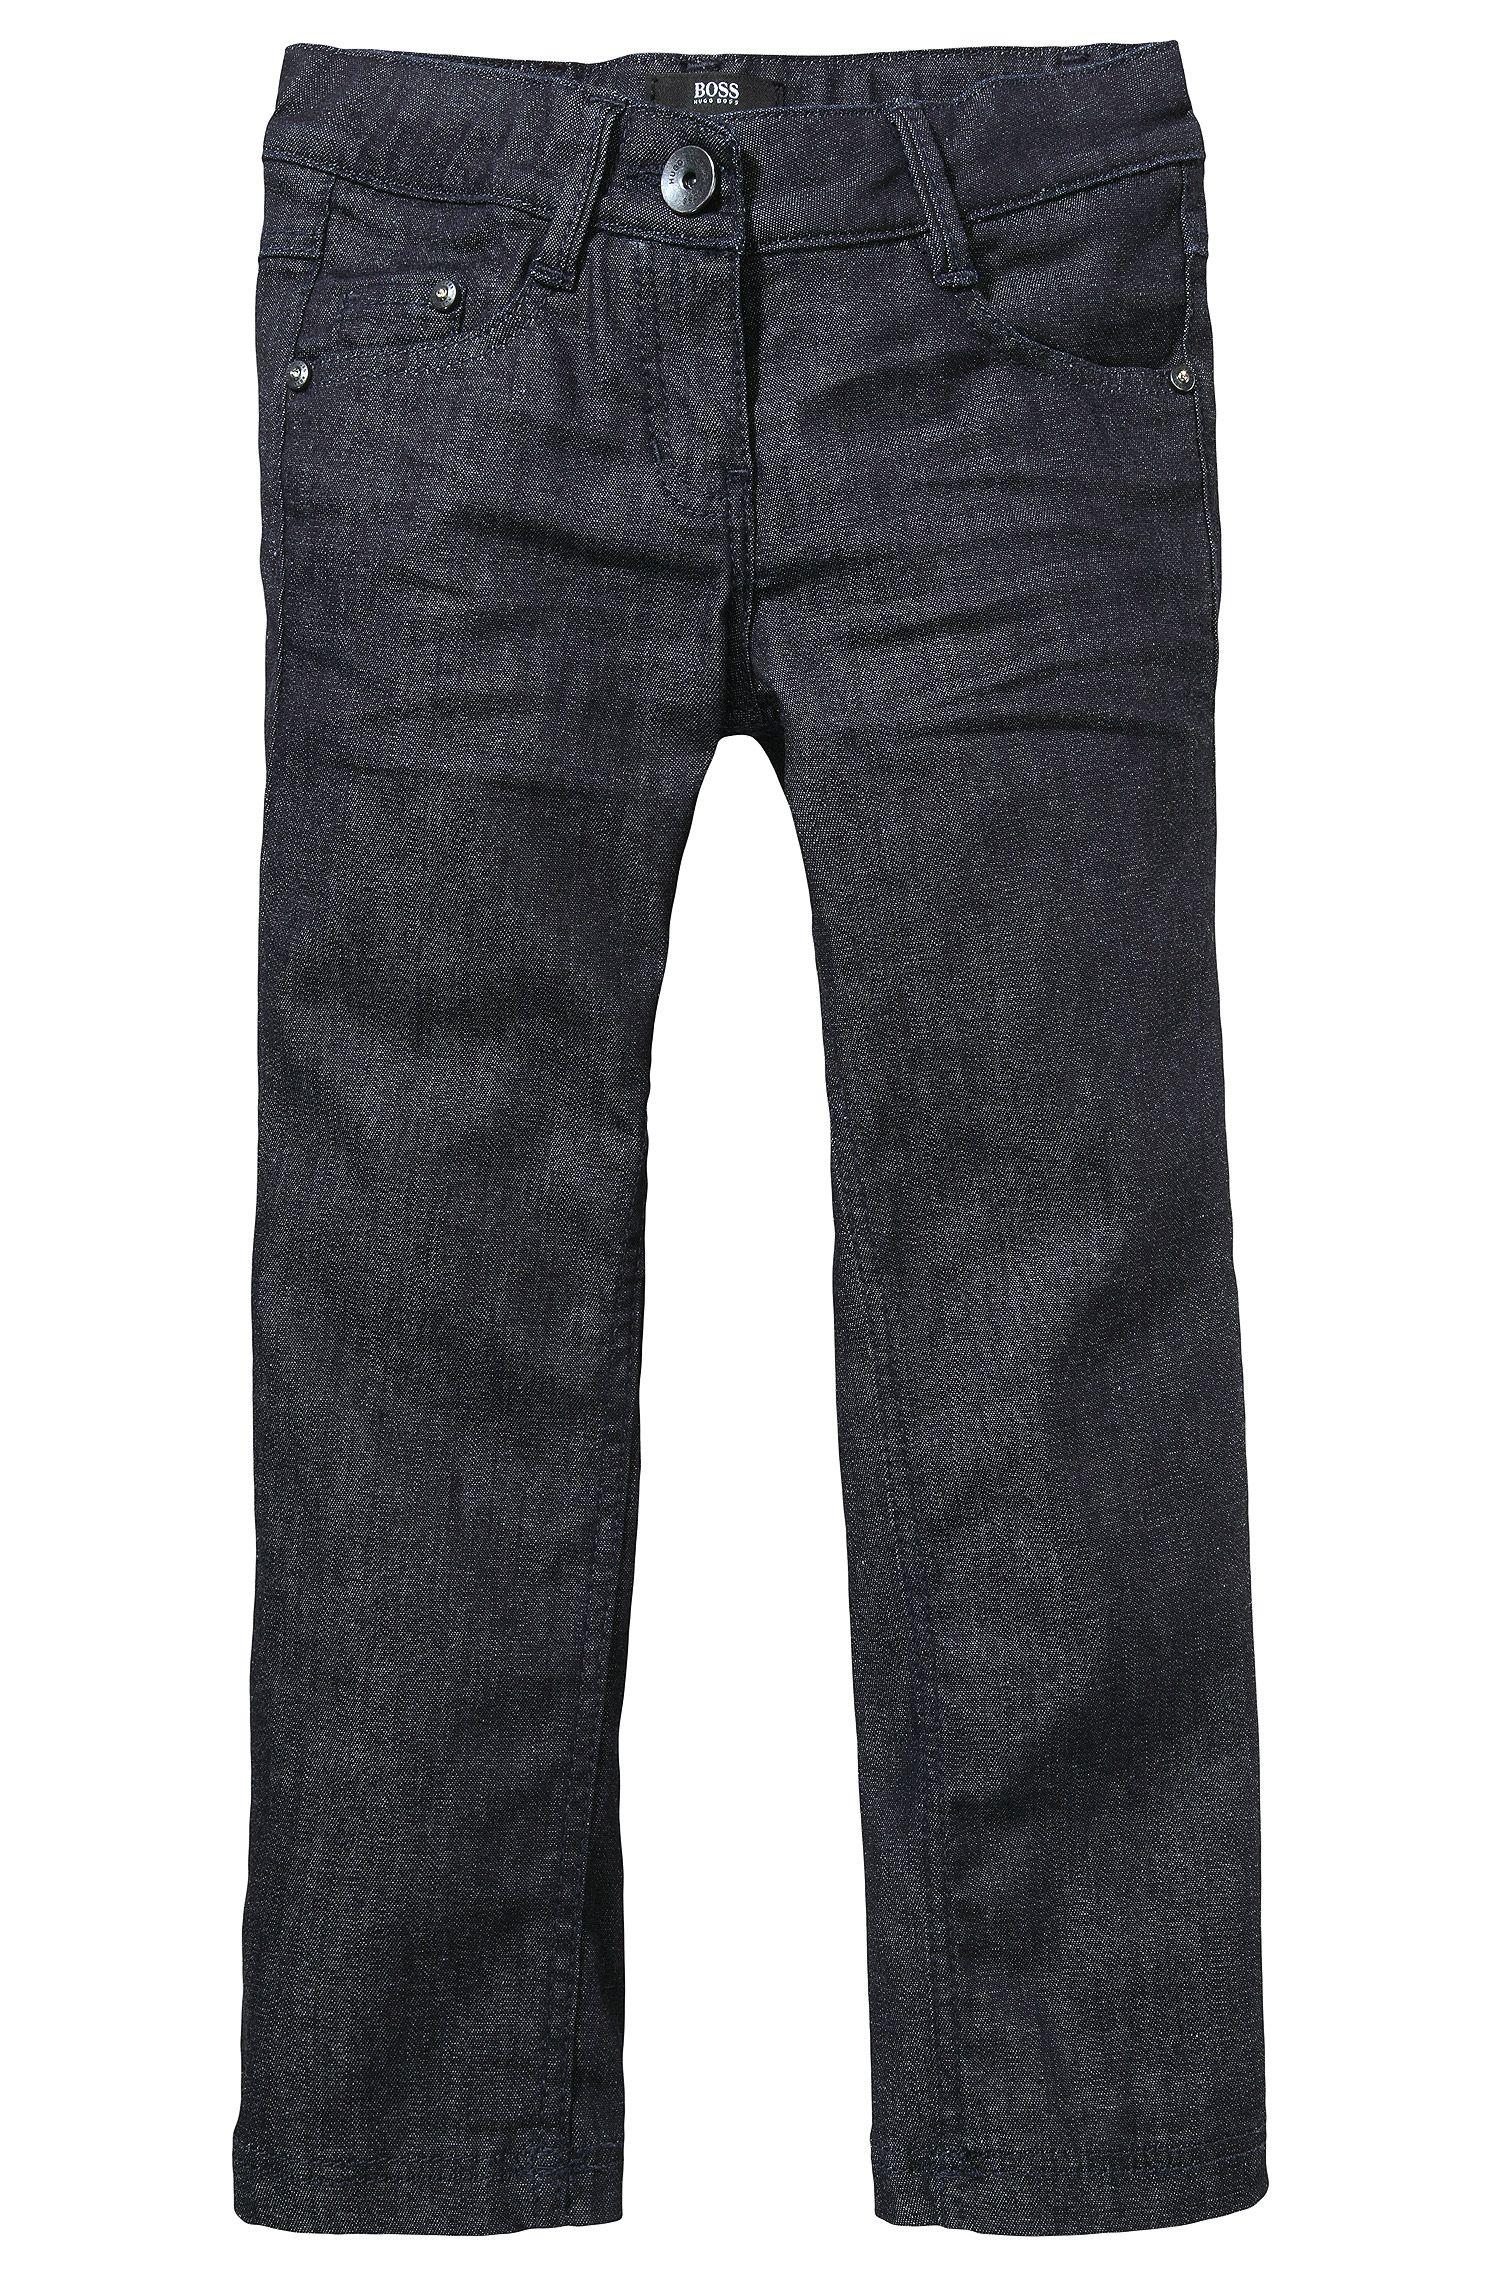 Kids-Jeans ´J14140` aus Baumwoll-Mix